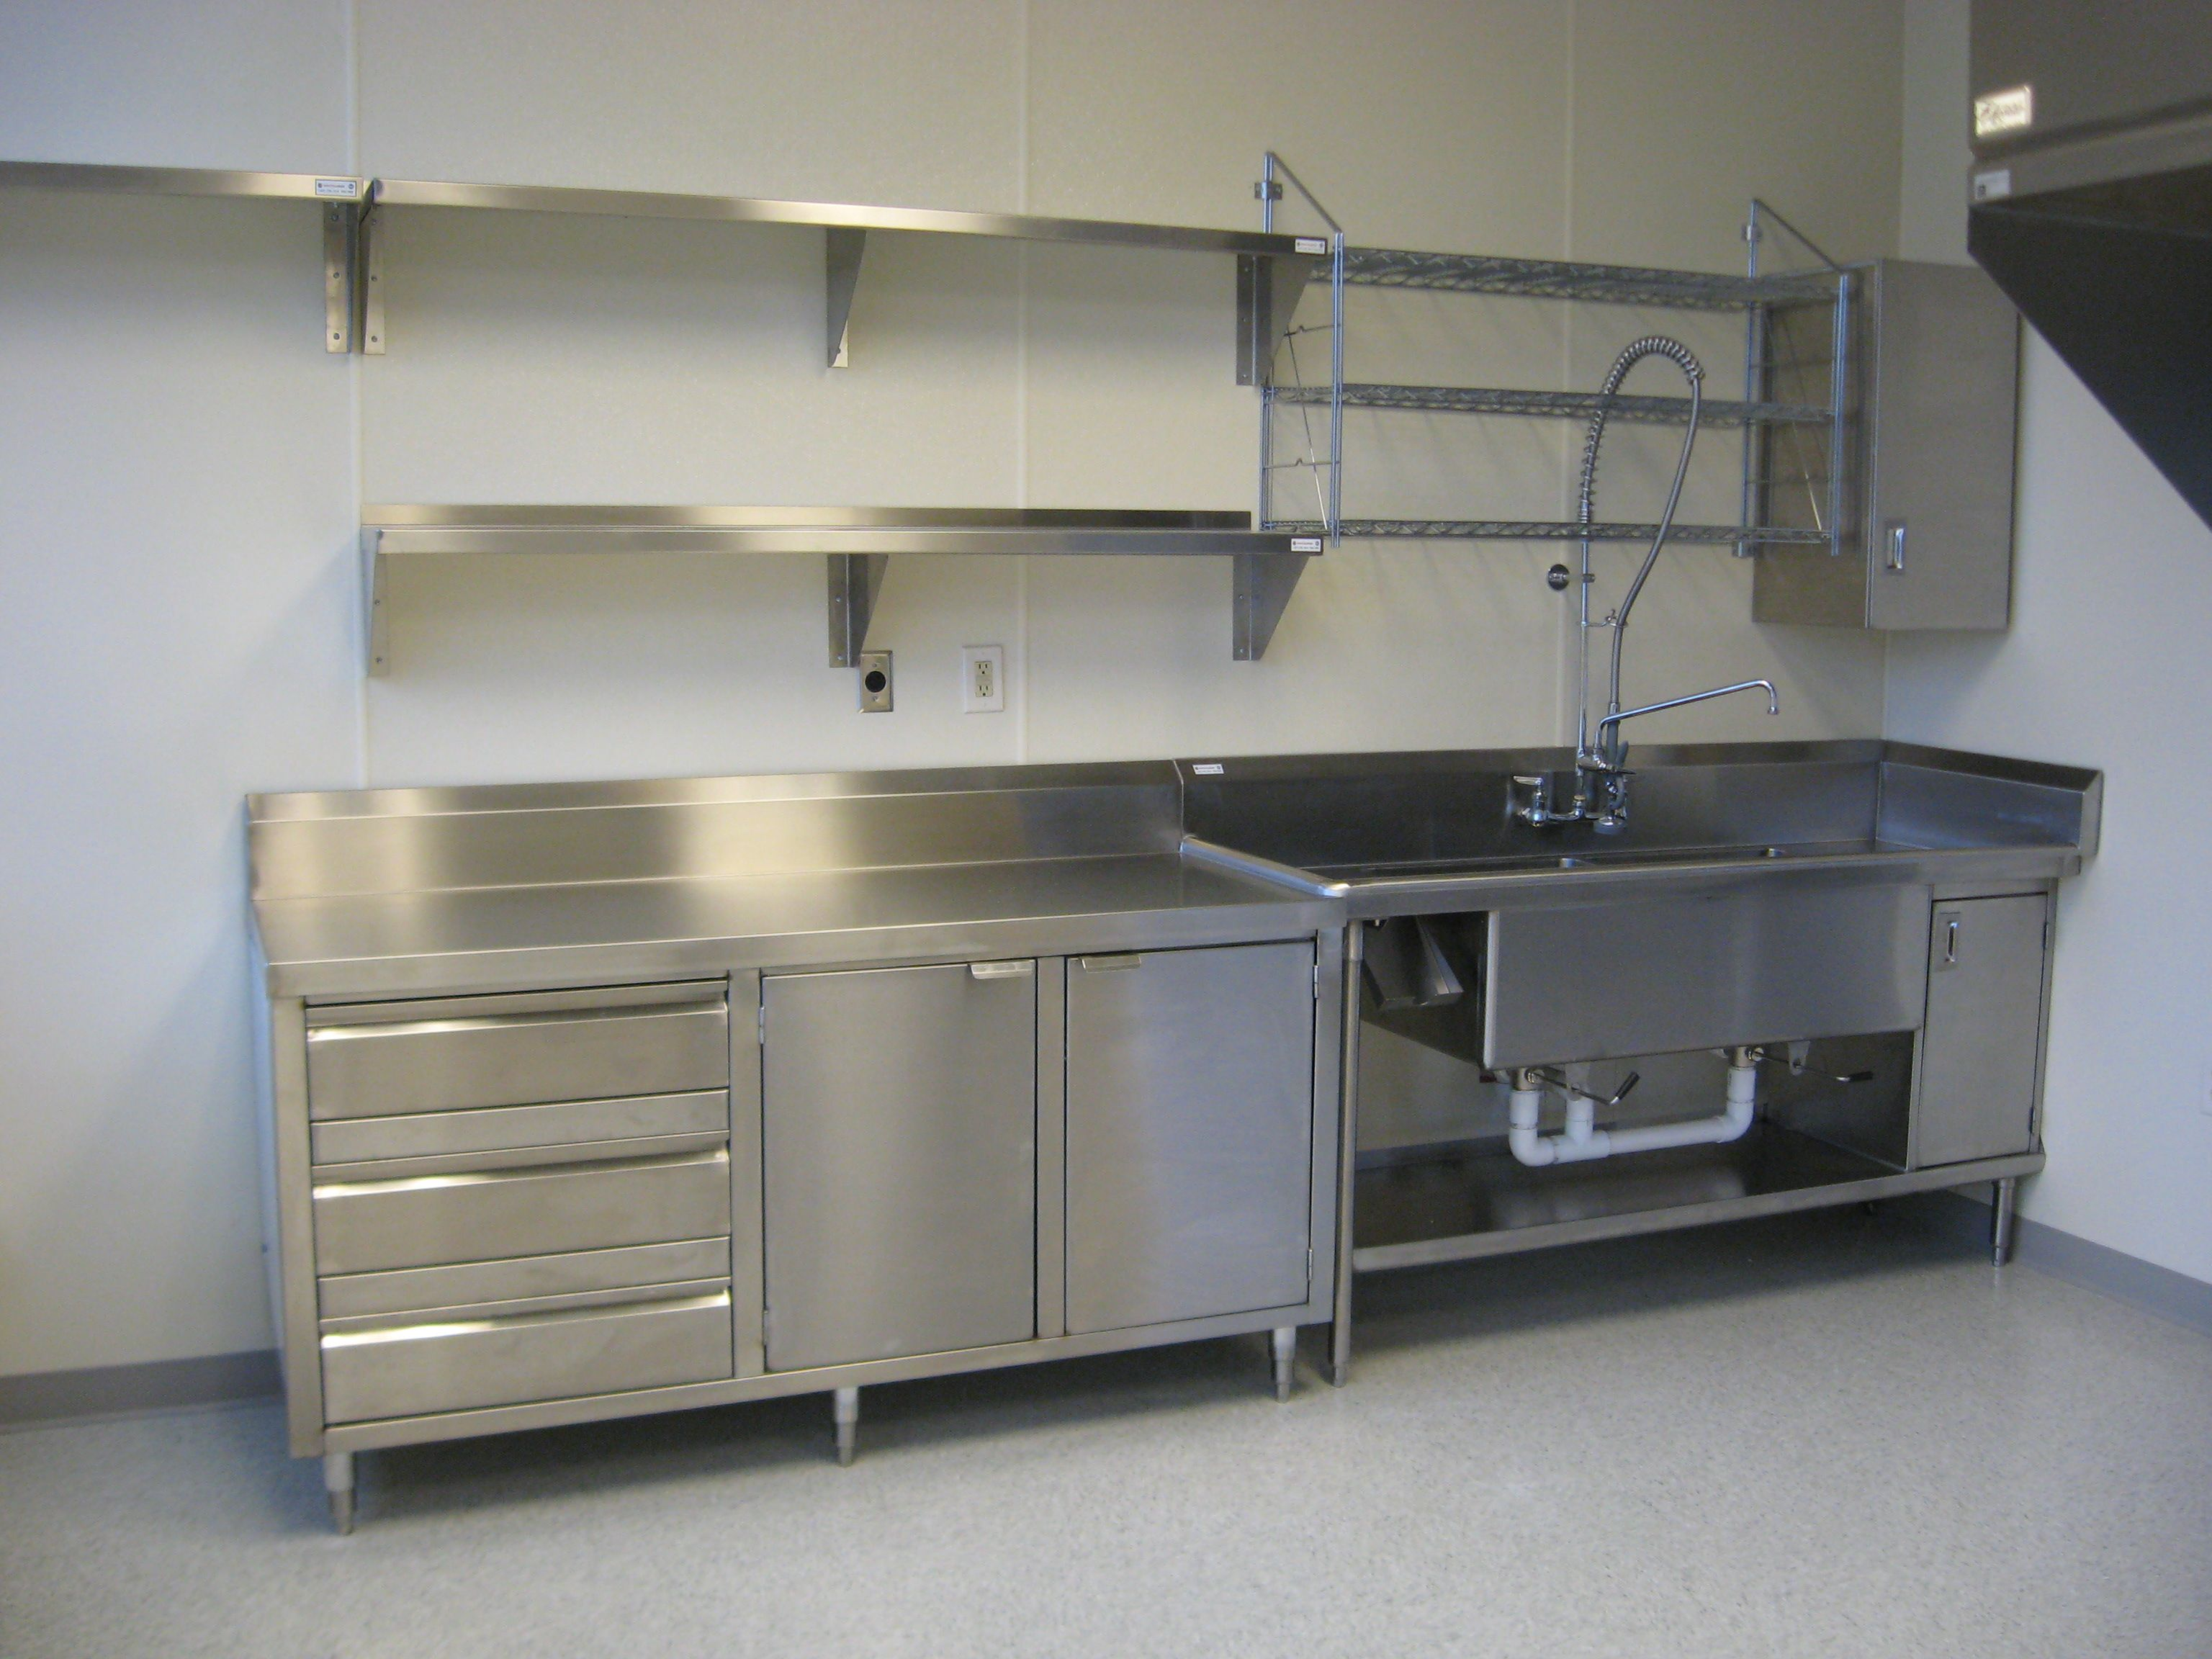 stainless steel kitchen racks valance curtains shelves industrial pinterest